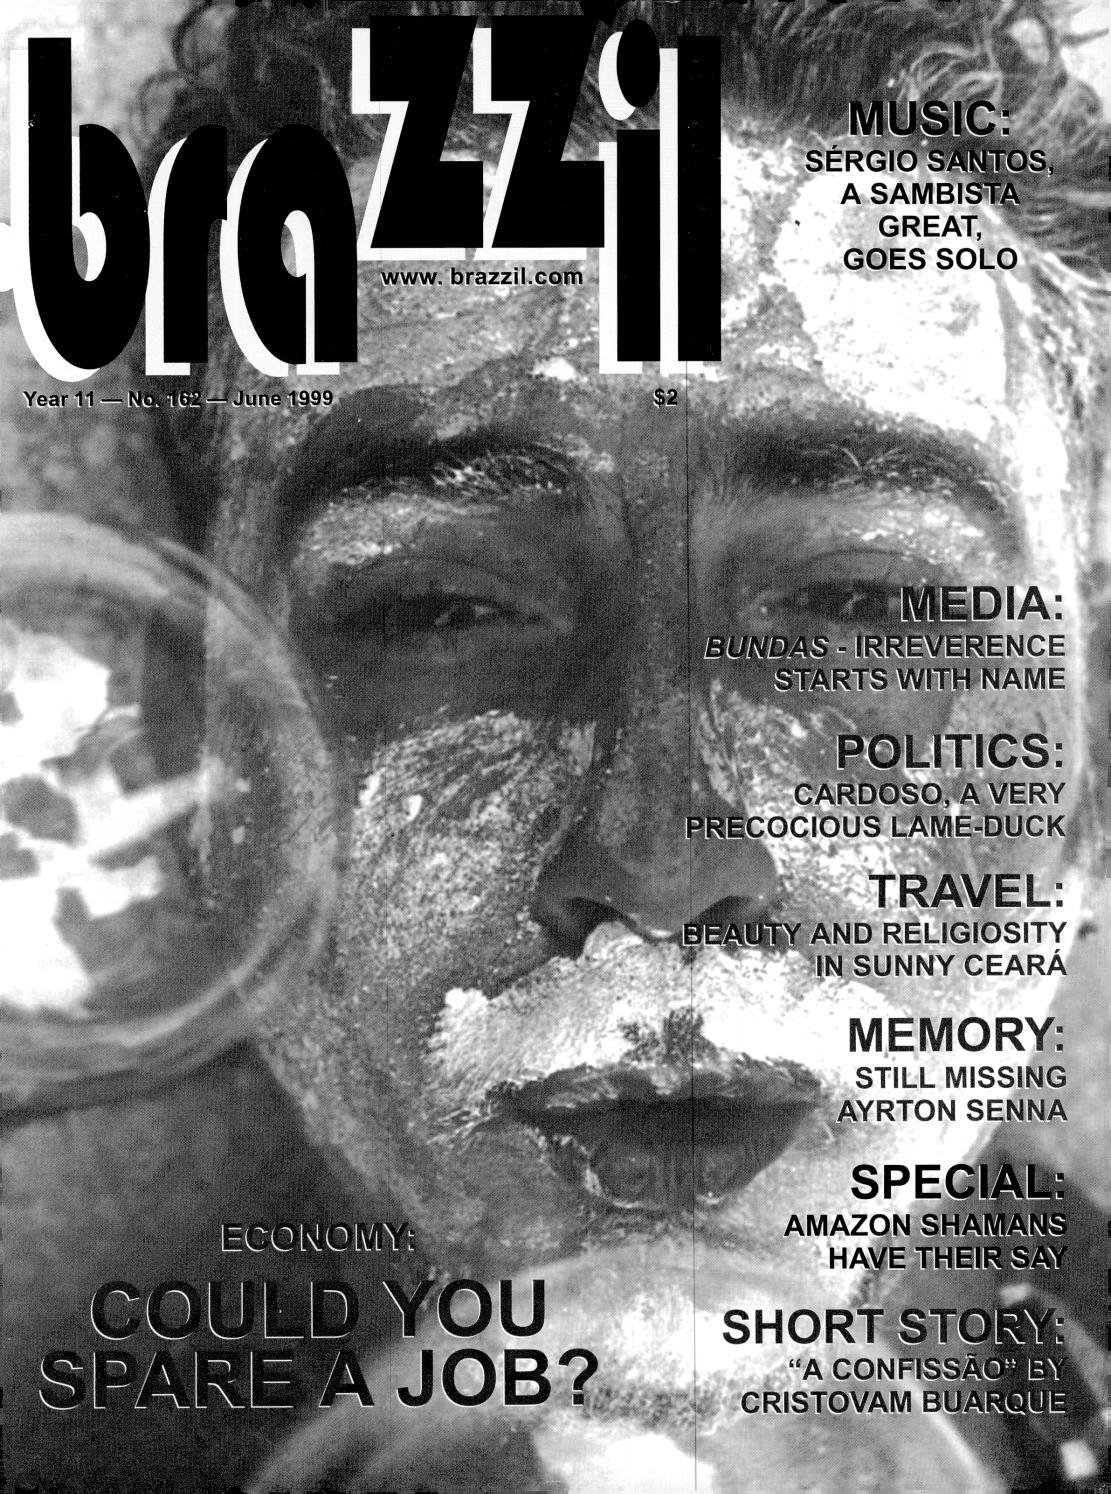 Brazzil Year 11 Number 162 June 1999 By Brazzil Magazine Issuu